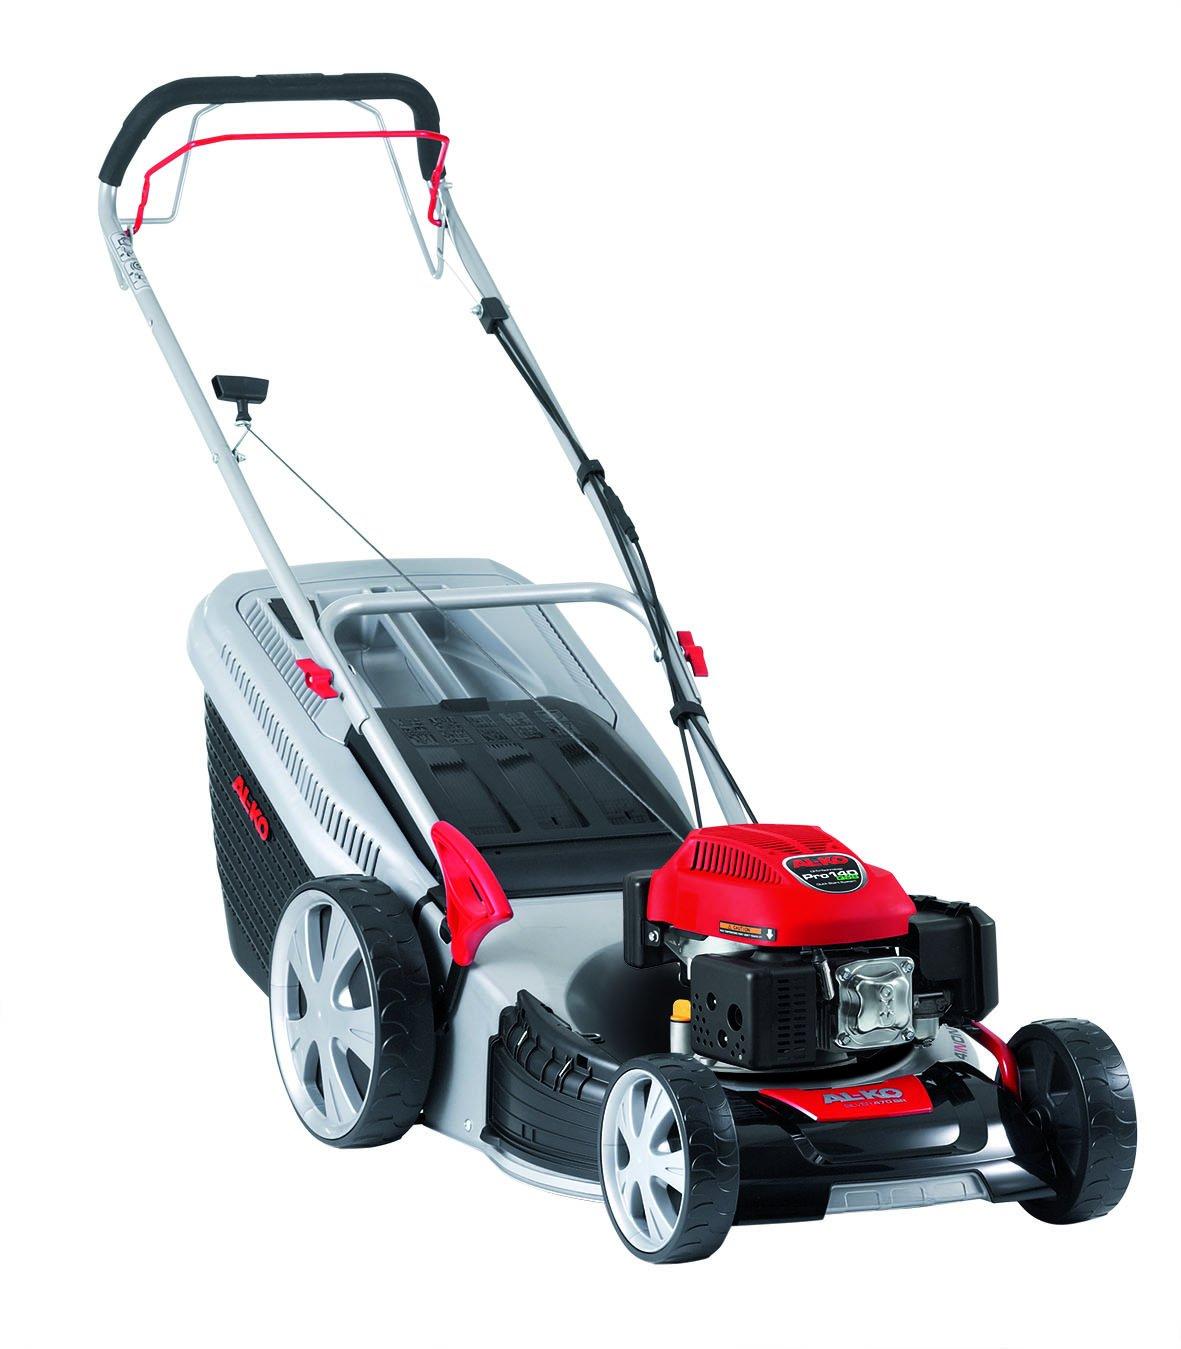 AL-KO Premium 474 SP-A Walk behind lawn mower Gasolina ...